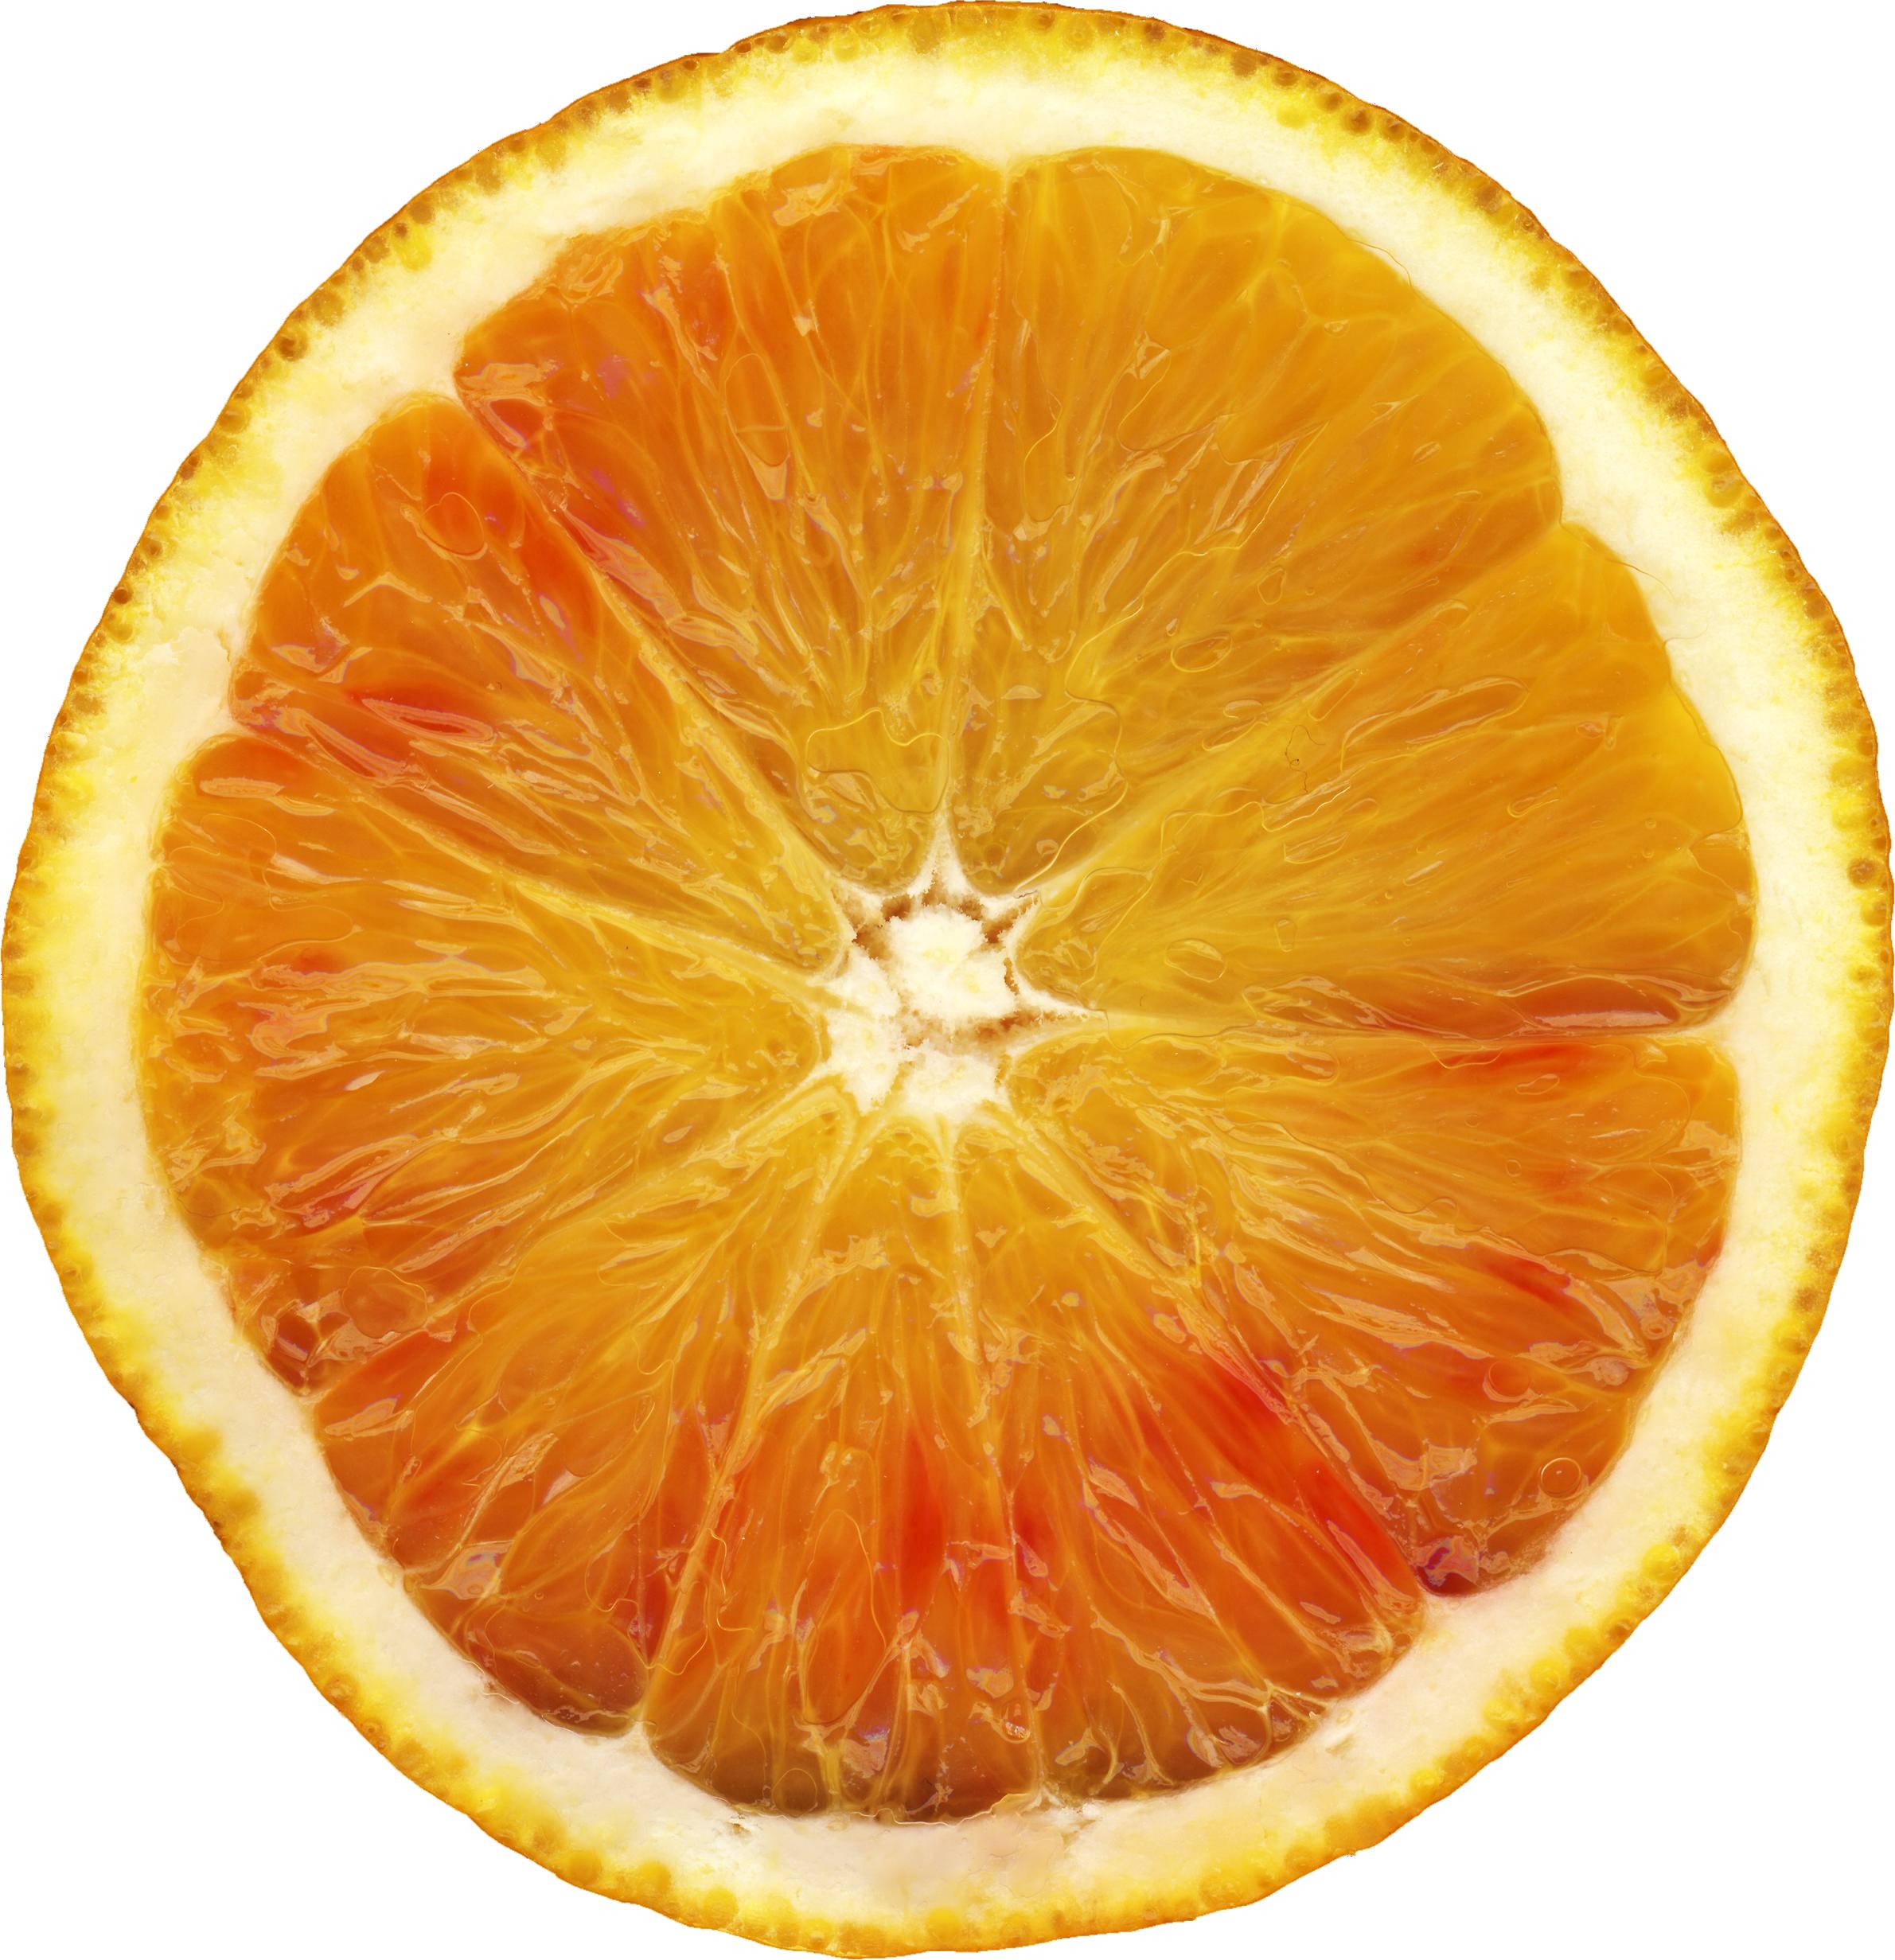 Orange orang pencil and. Fruit clipart silhouette